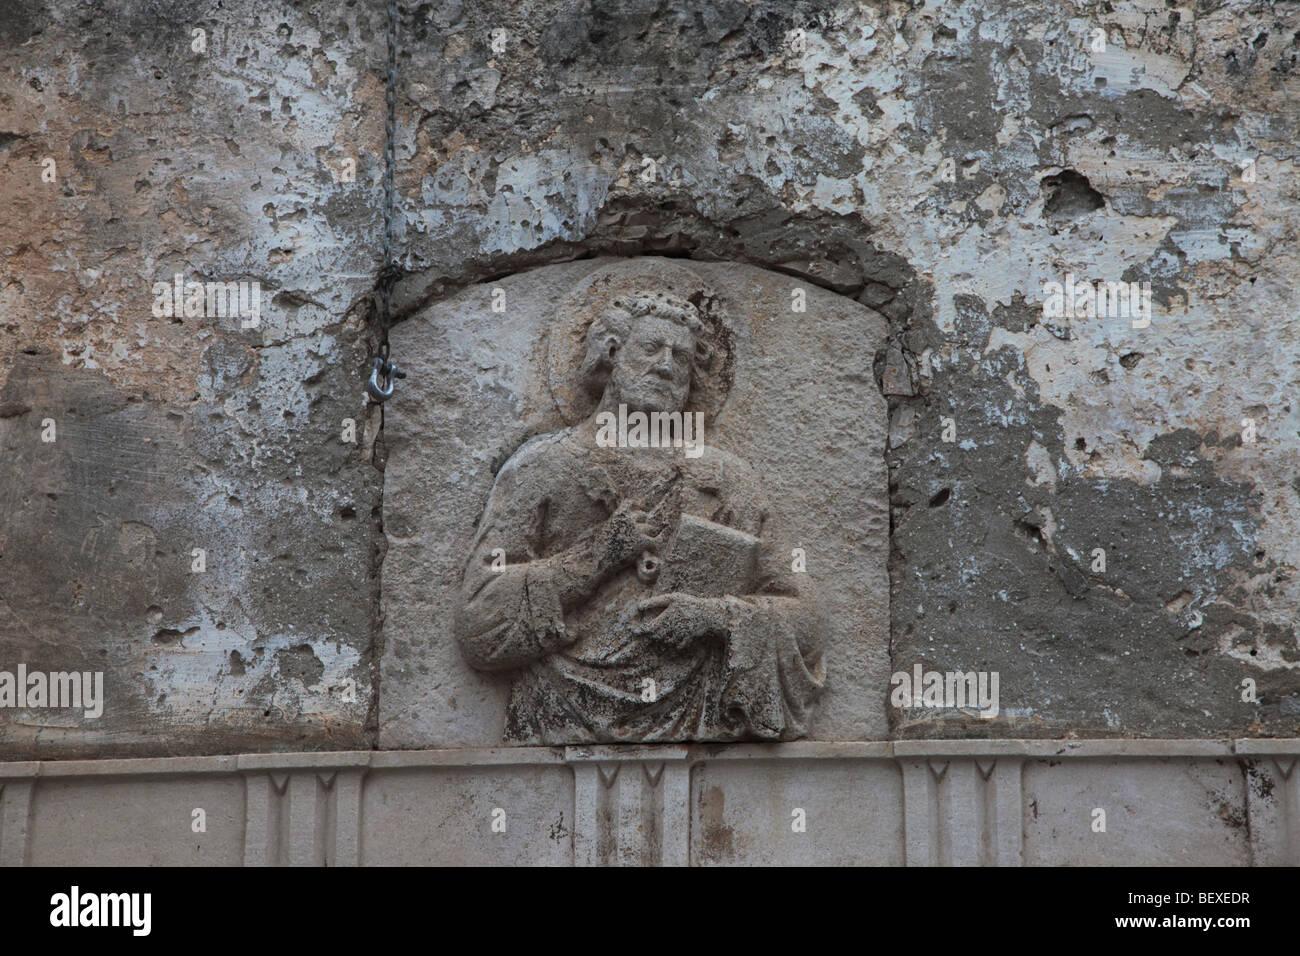 Frieze on wall of Church of All Saints on island of Korcula, Croatia - Stock Image